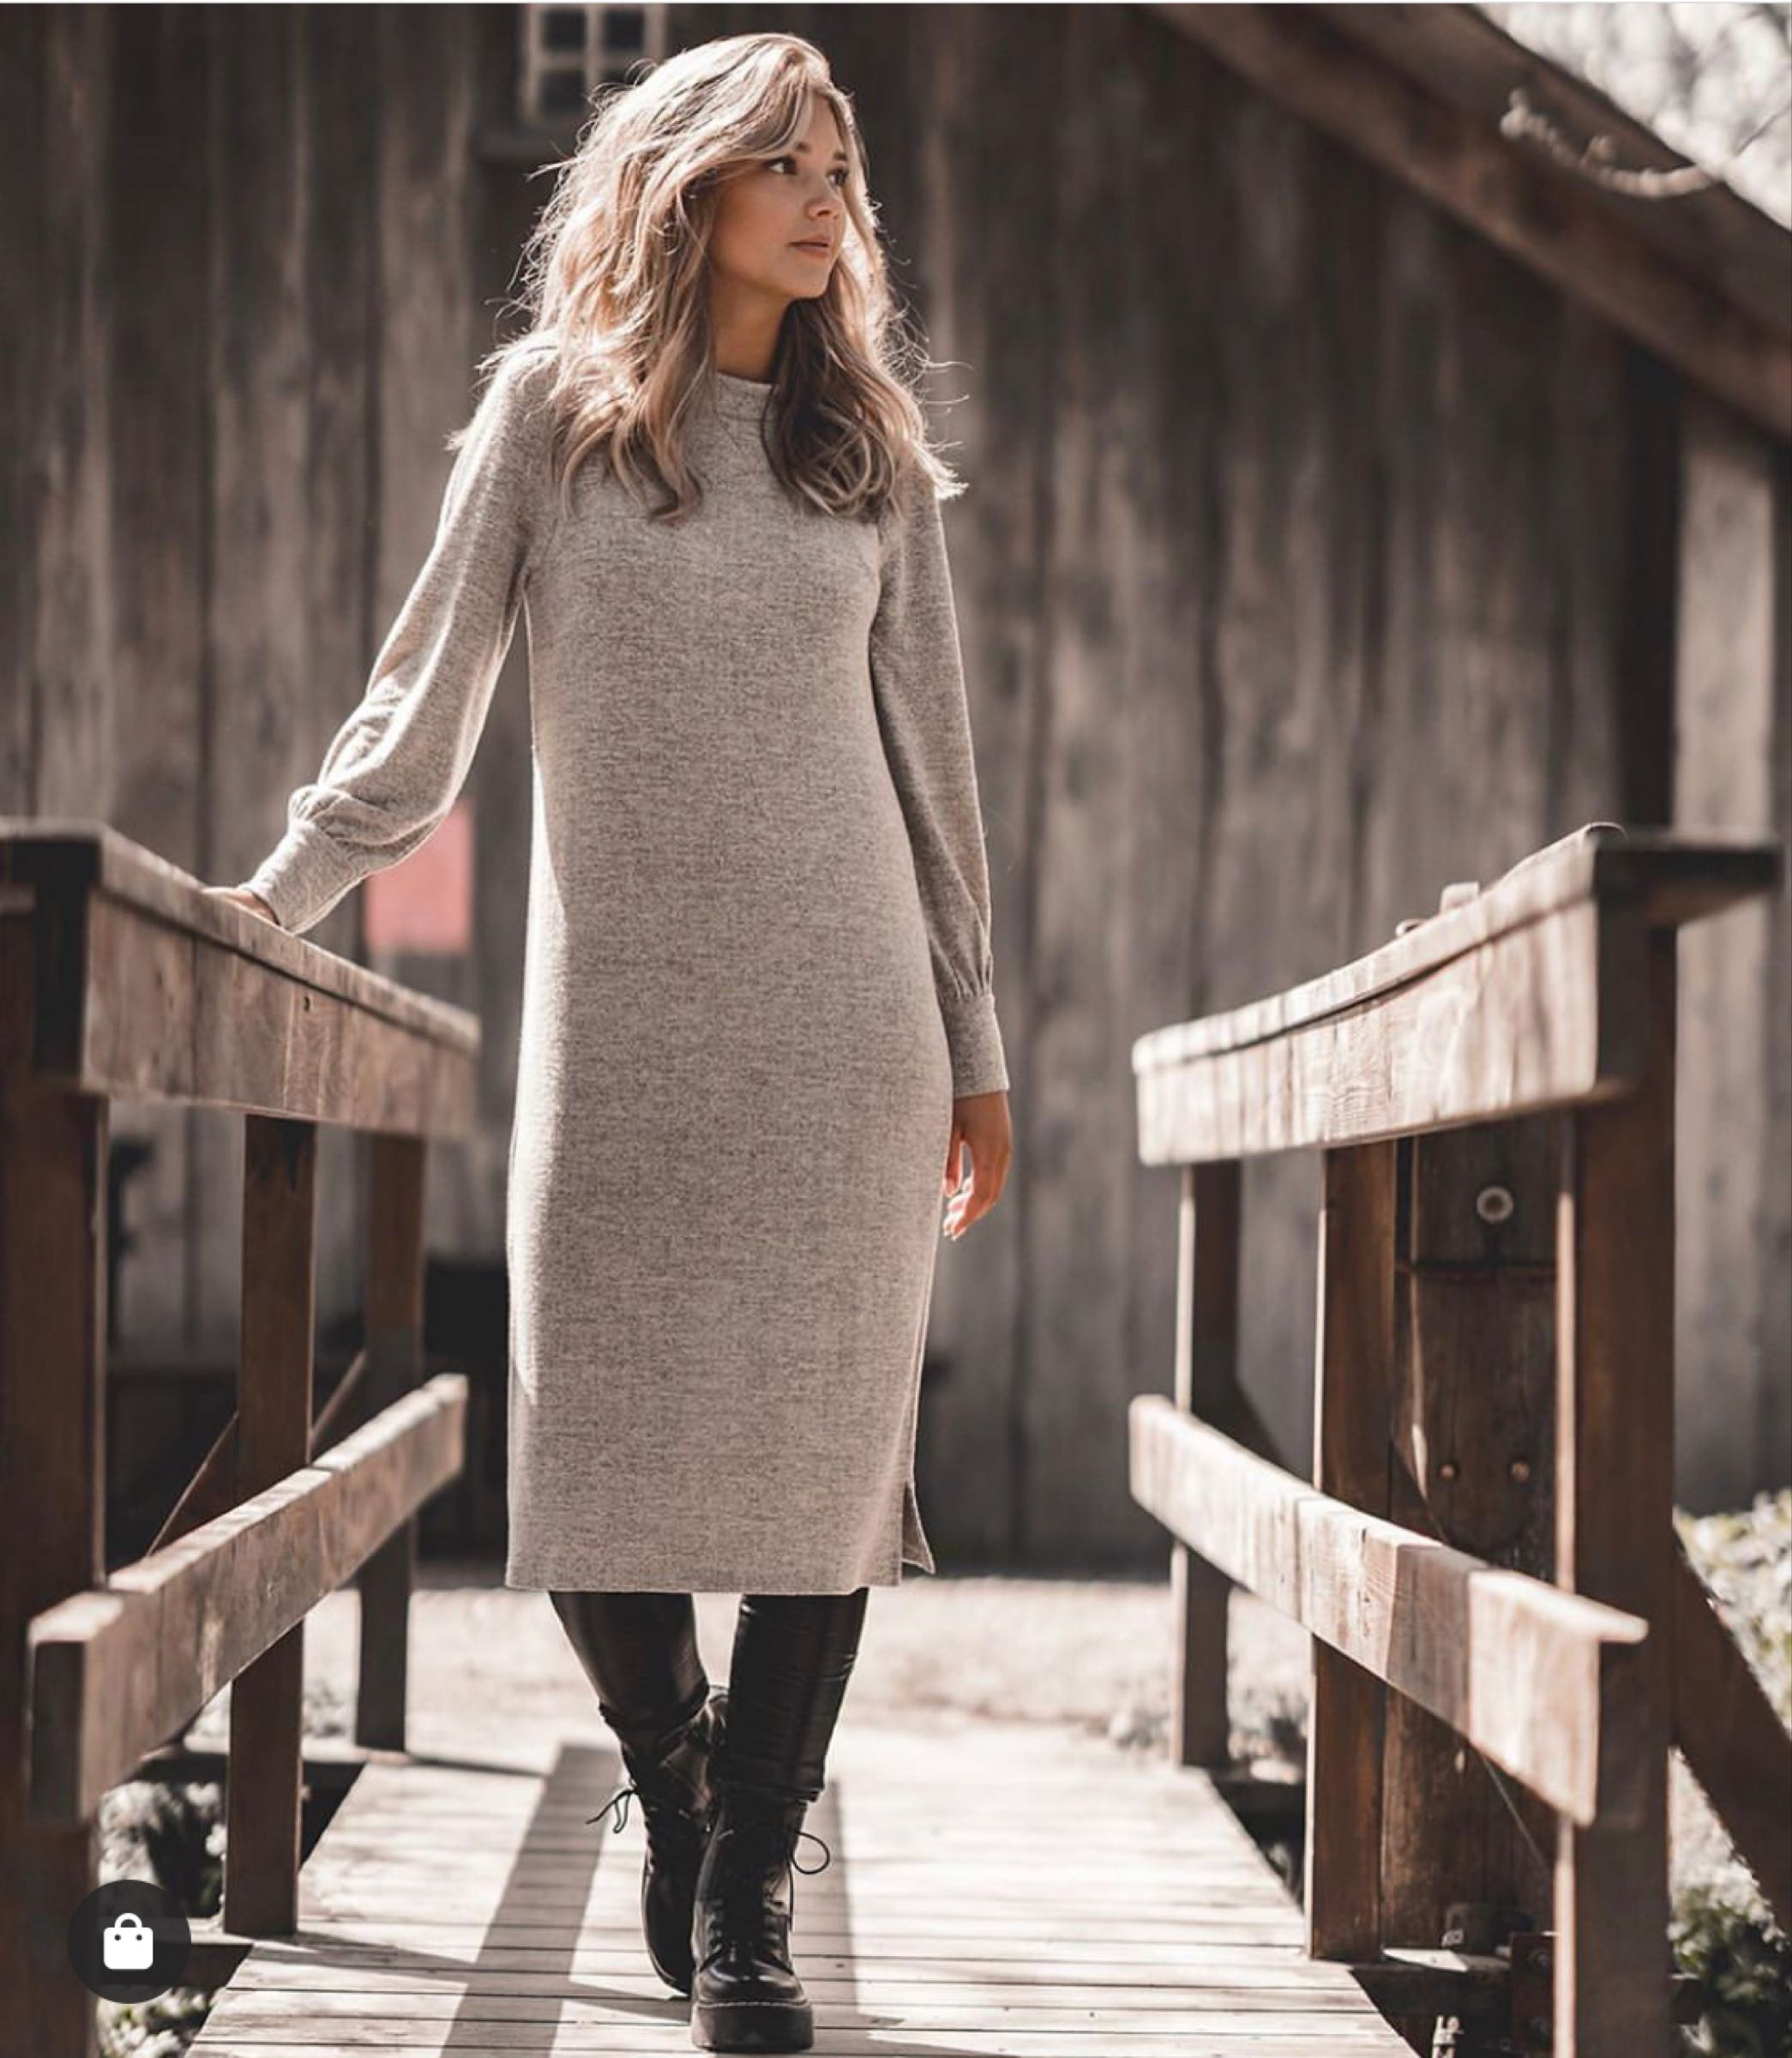 JACKIE klänning, Sandstone